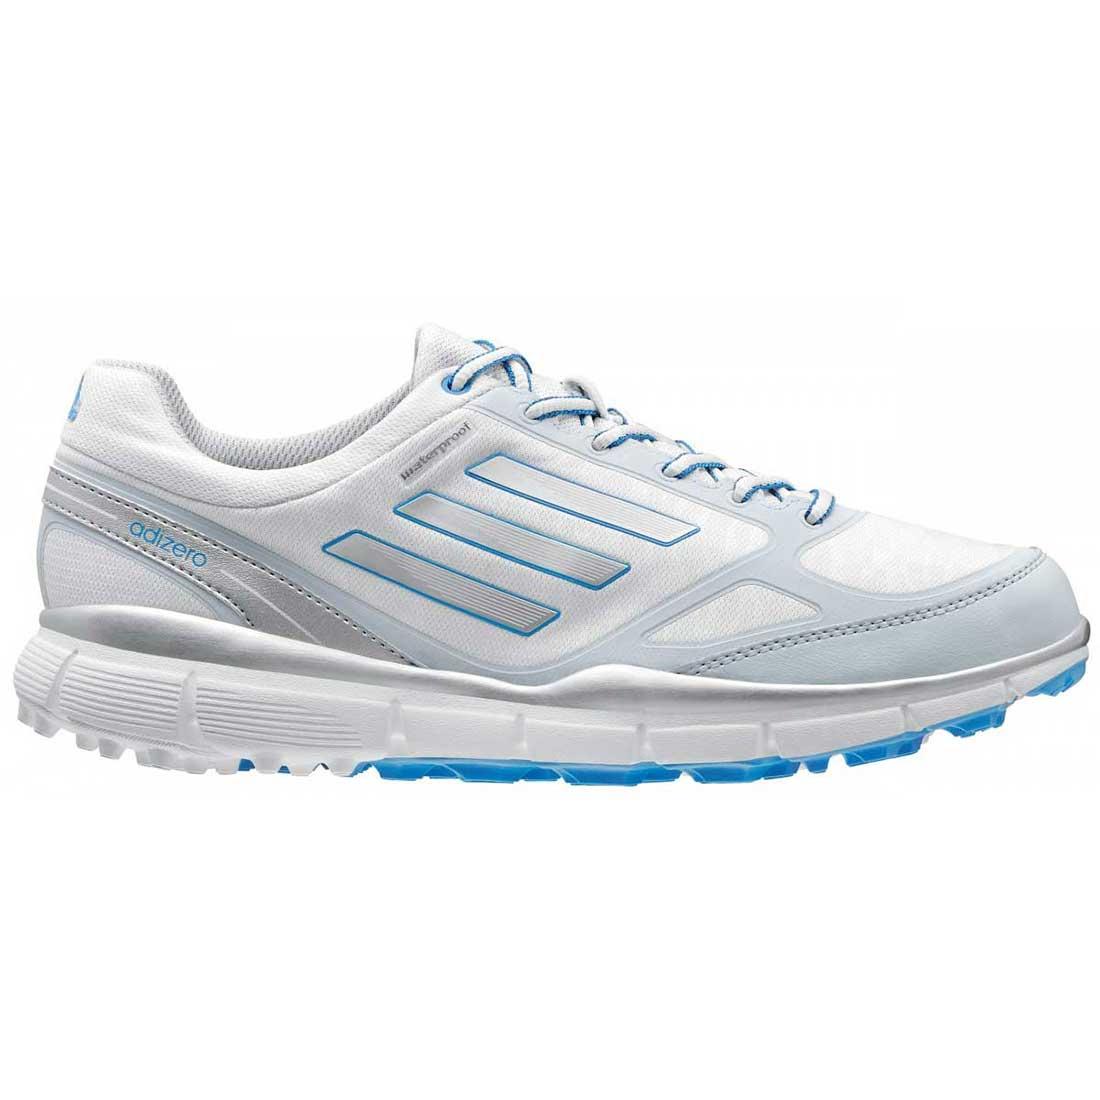 new adidas s adizero sport iii golf shoes white